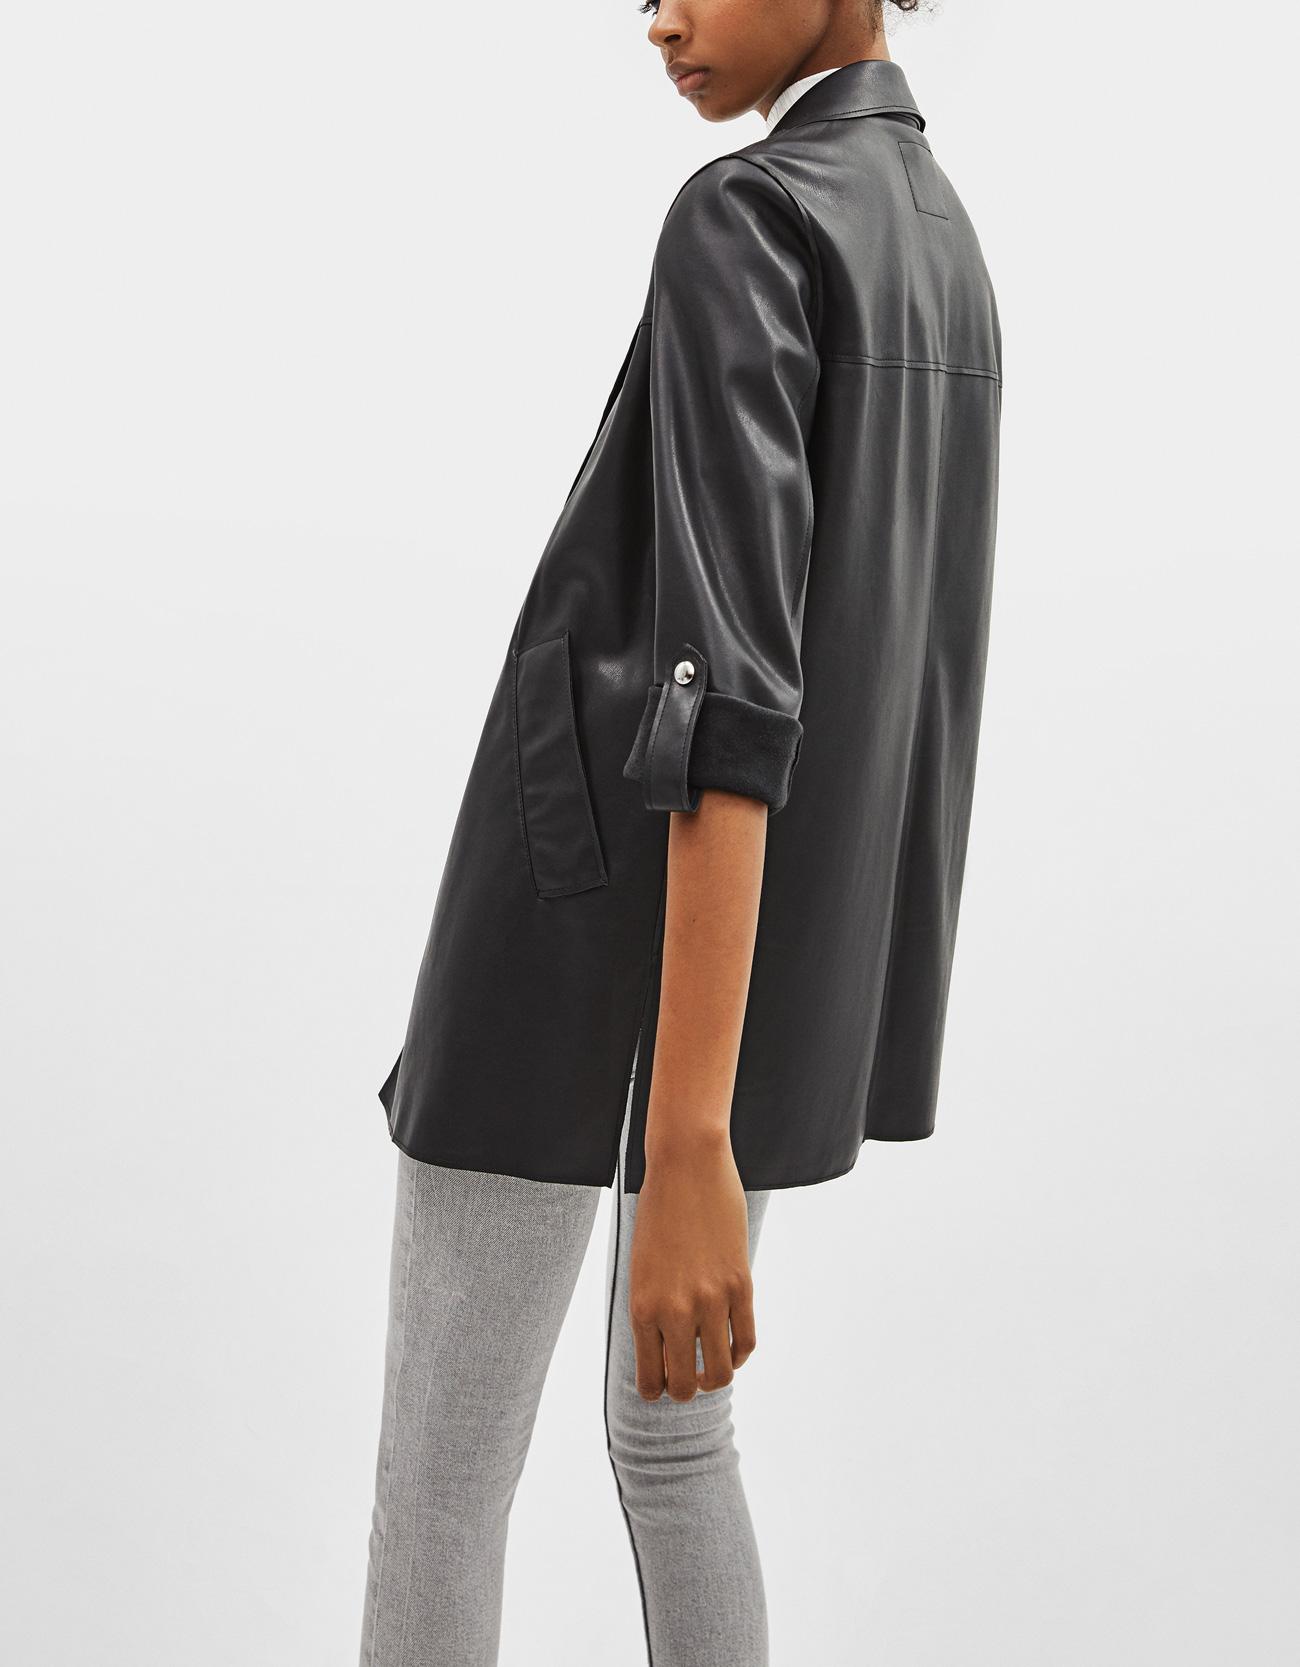 8e16a02c78f8 Faux leather coat - Jackets - Bershka Mainland China   中国大陆